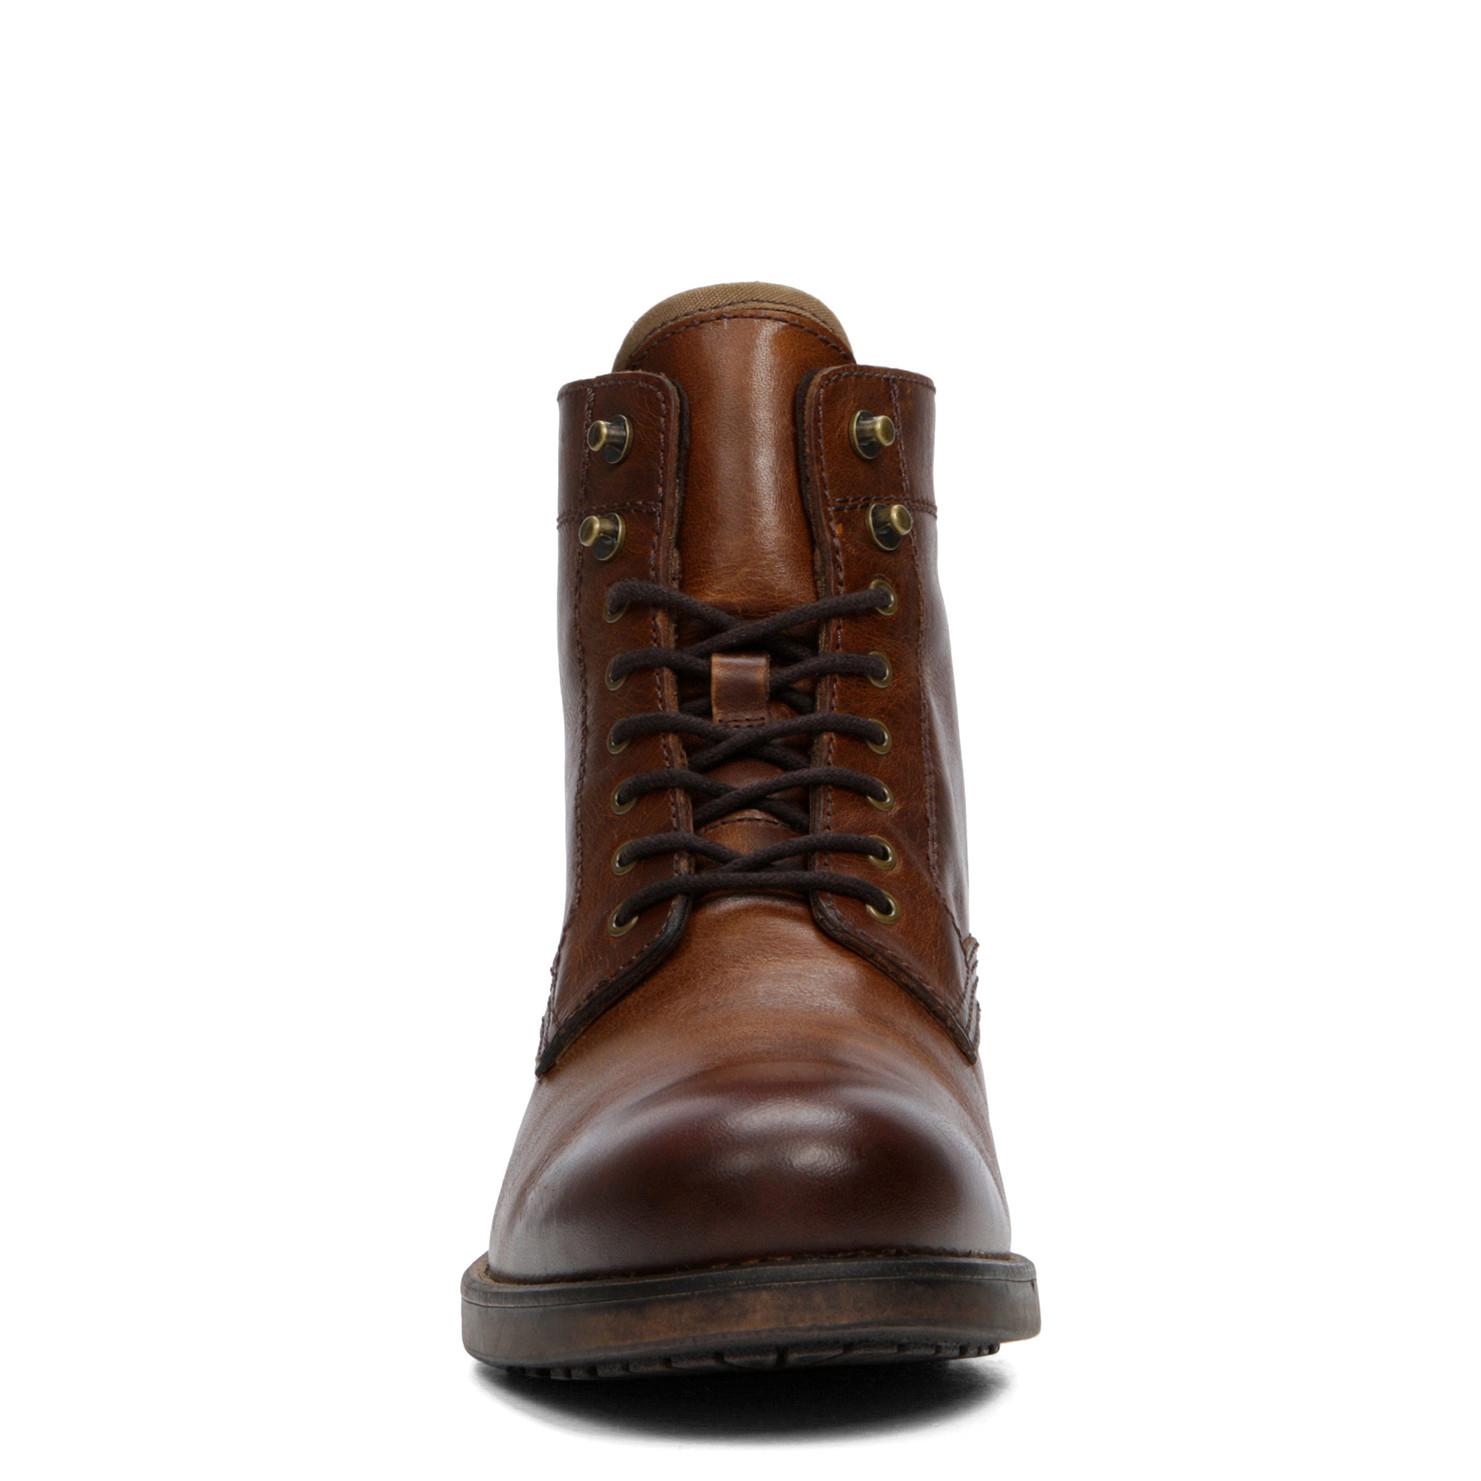 ALDO Etausen Leather Ankle Boots in Cognac (Brown) for Men